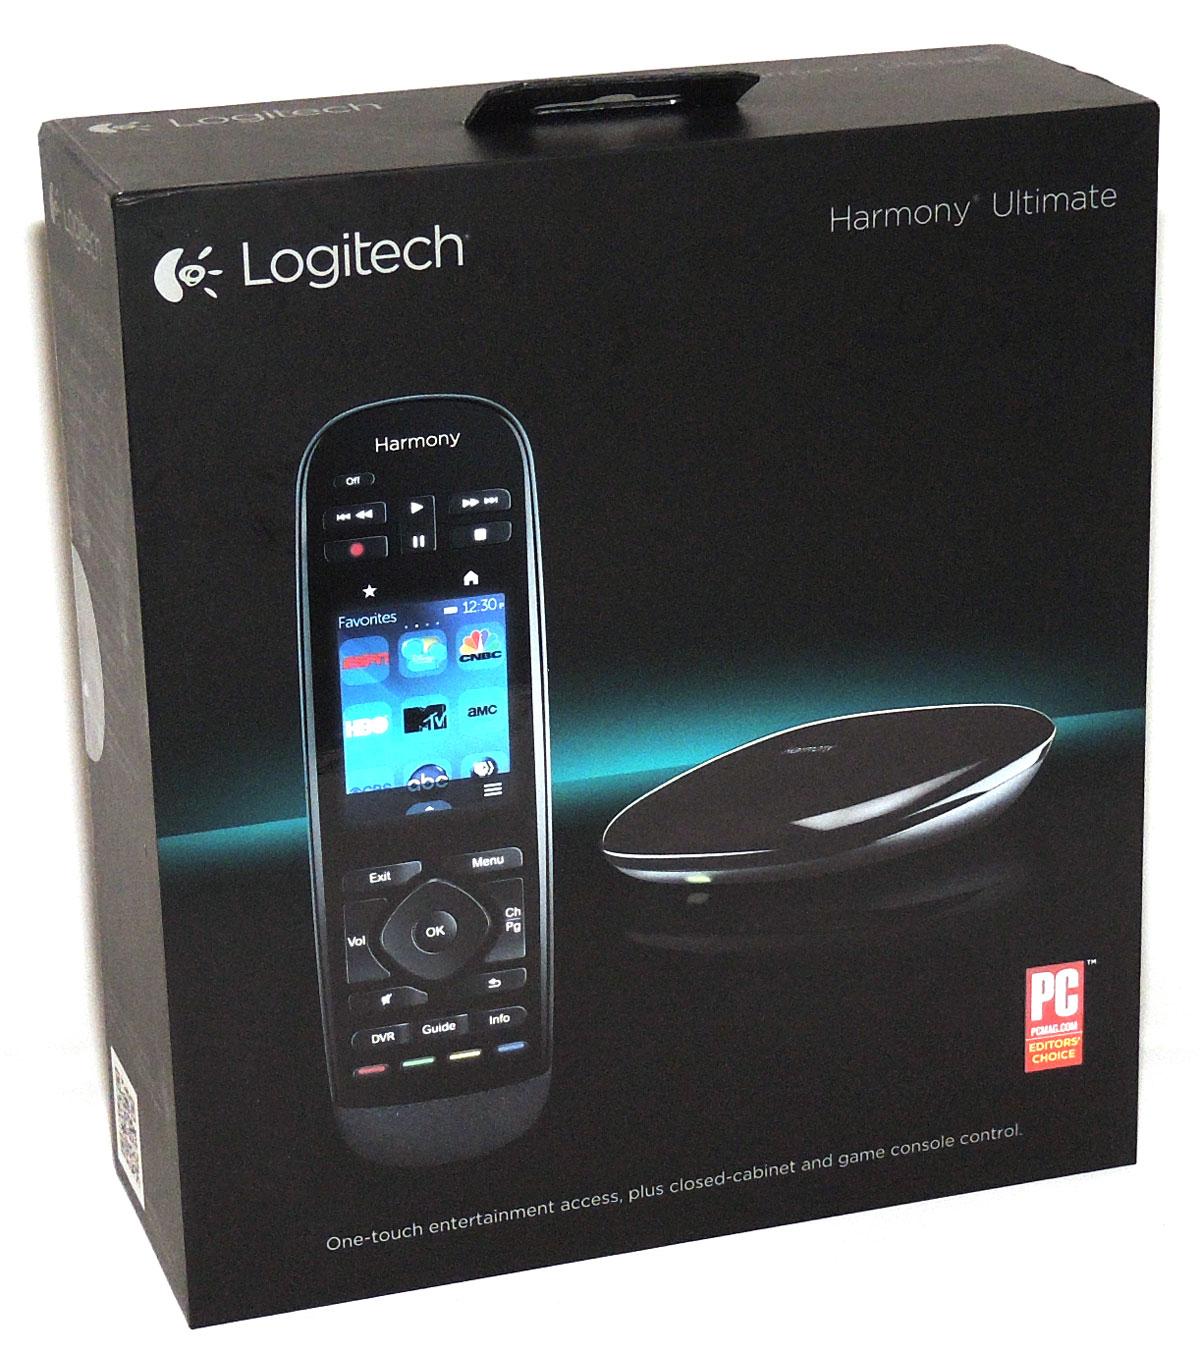 Logitech Harmony Ultimate Fernbedienung um 136 € - 32% sparen